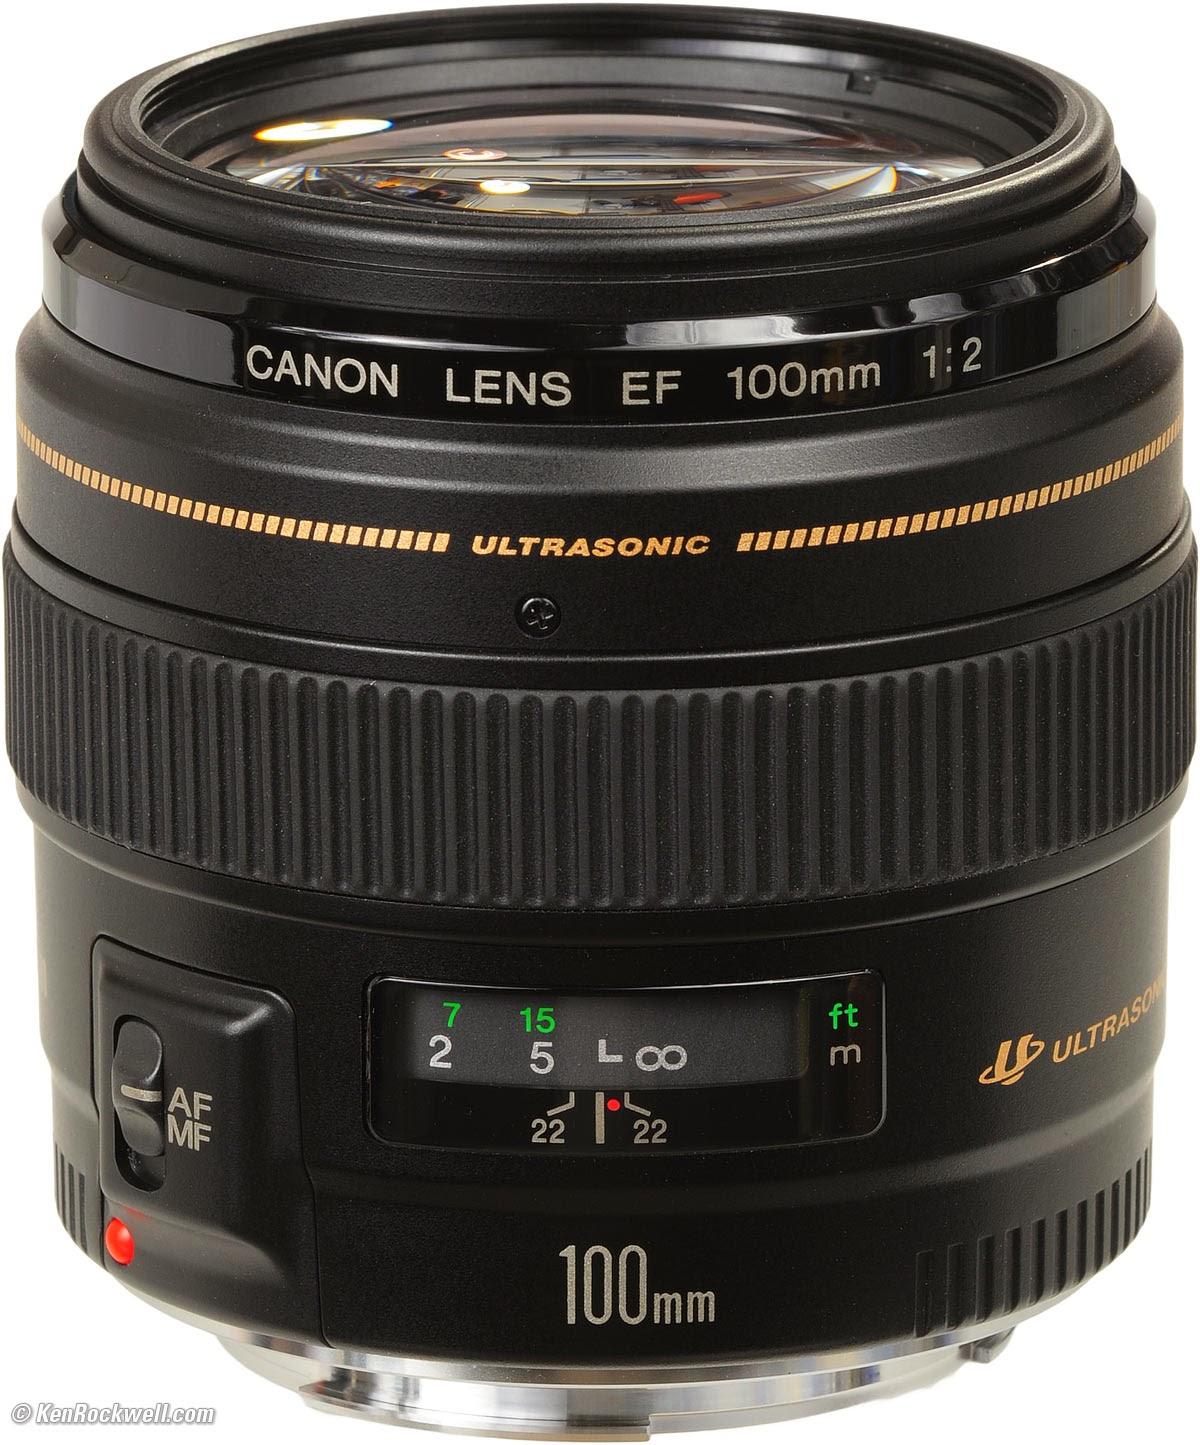 Harga Lensa Canon EF 100mm f/2 USM Terbaru